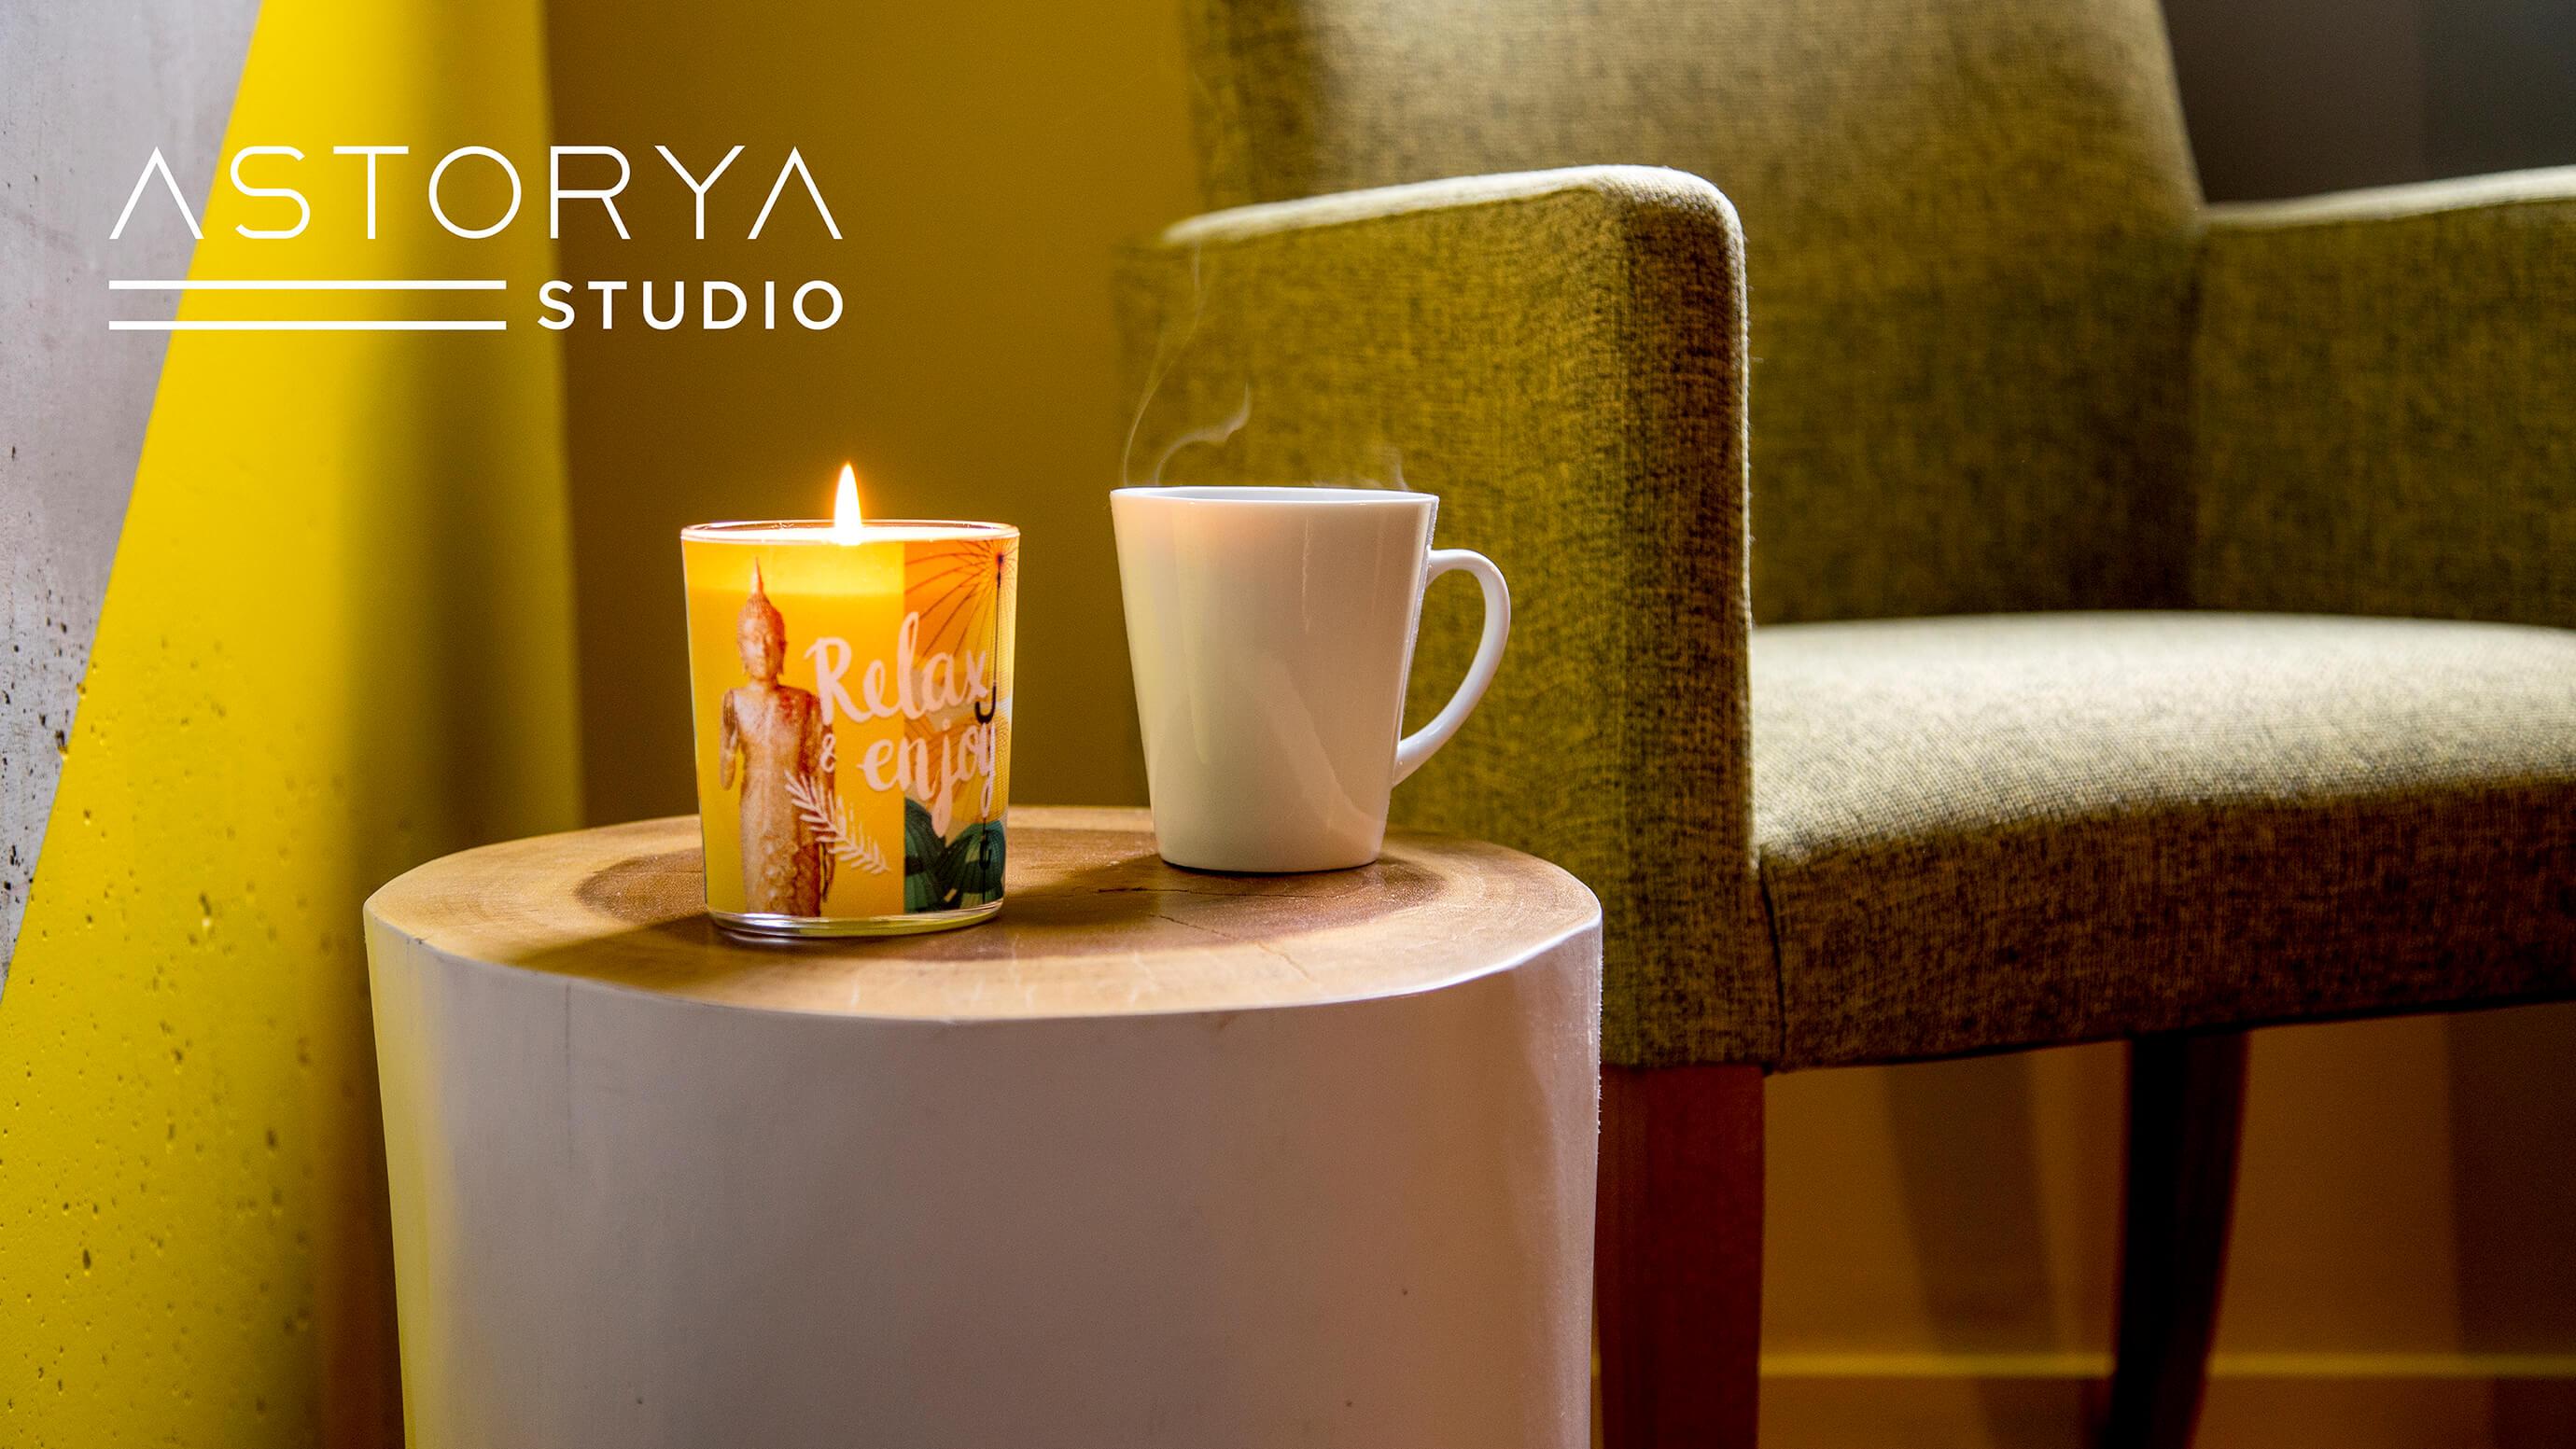 astorya fabrication de bougies parfum es personnalisables. Black Bedroom Furniture Sets. Home Design Ideas